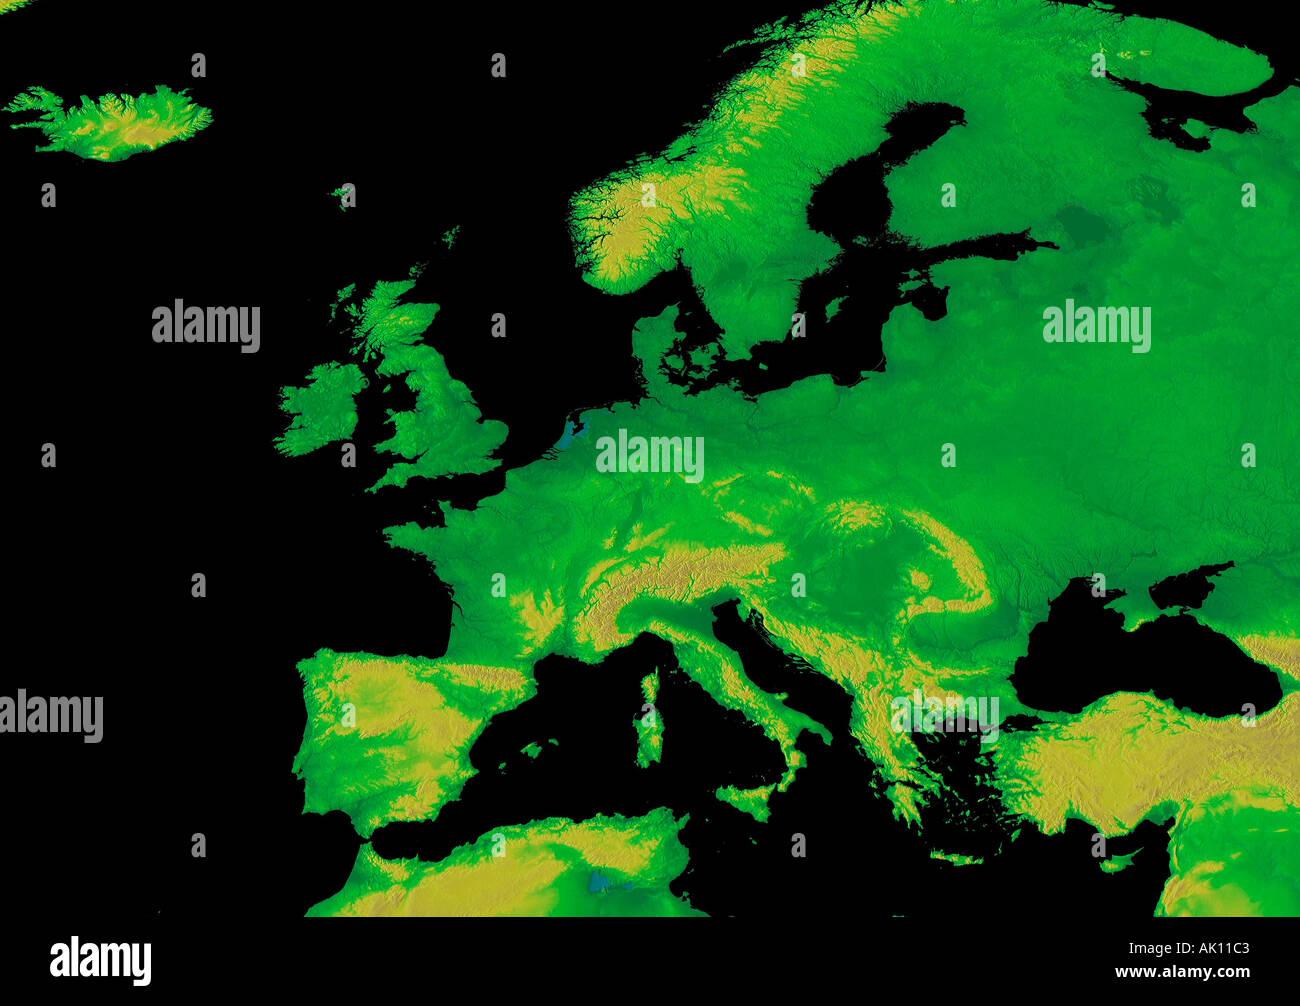 Digital Elevation Map Europe Earth Stock Photos Digital Elevation